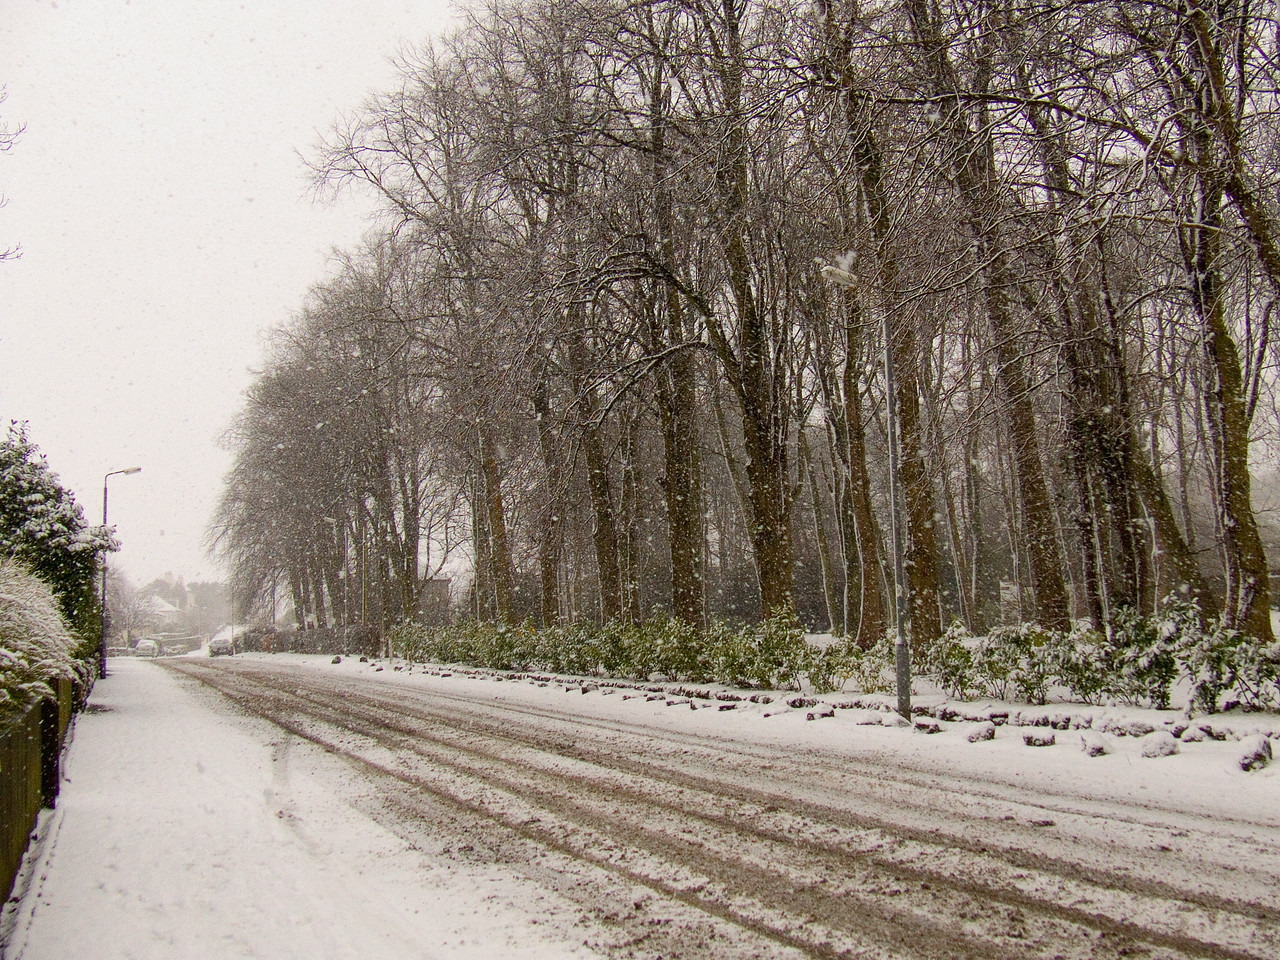 More heavy snow falling, Auchenlodment Road